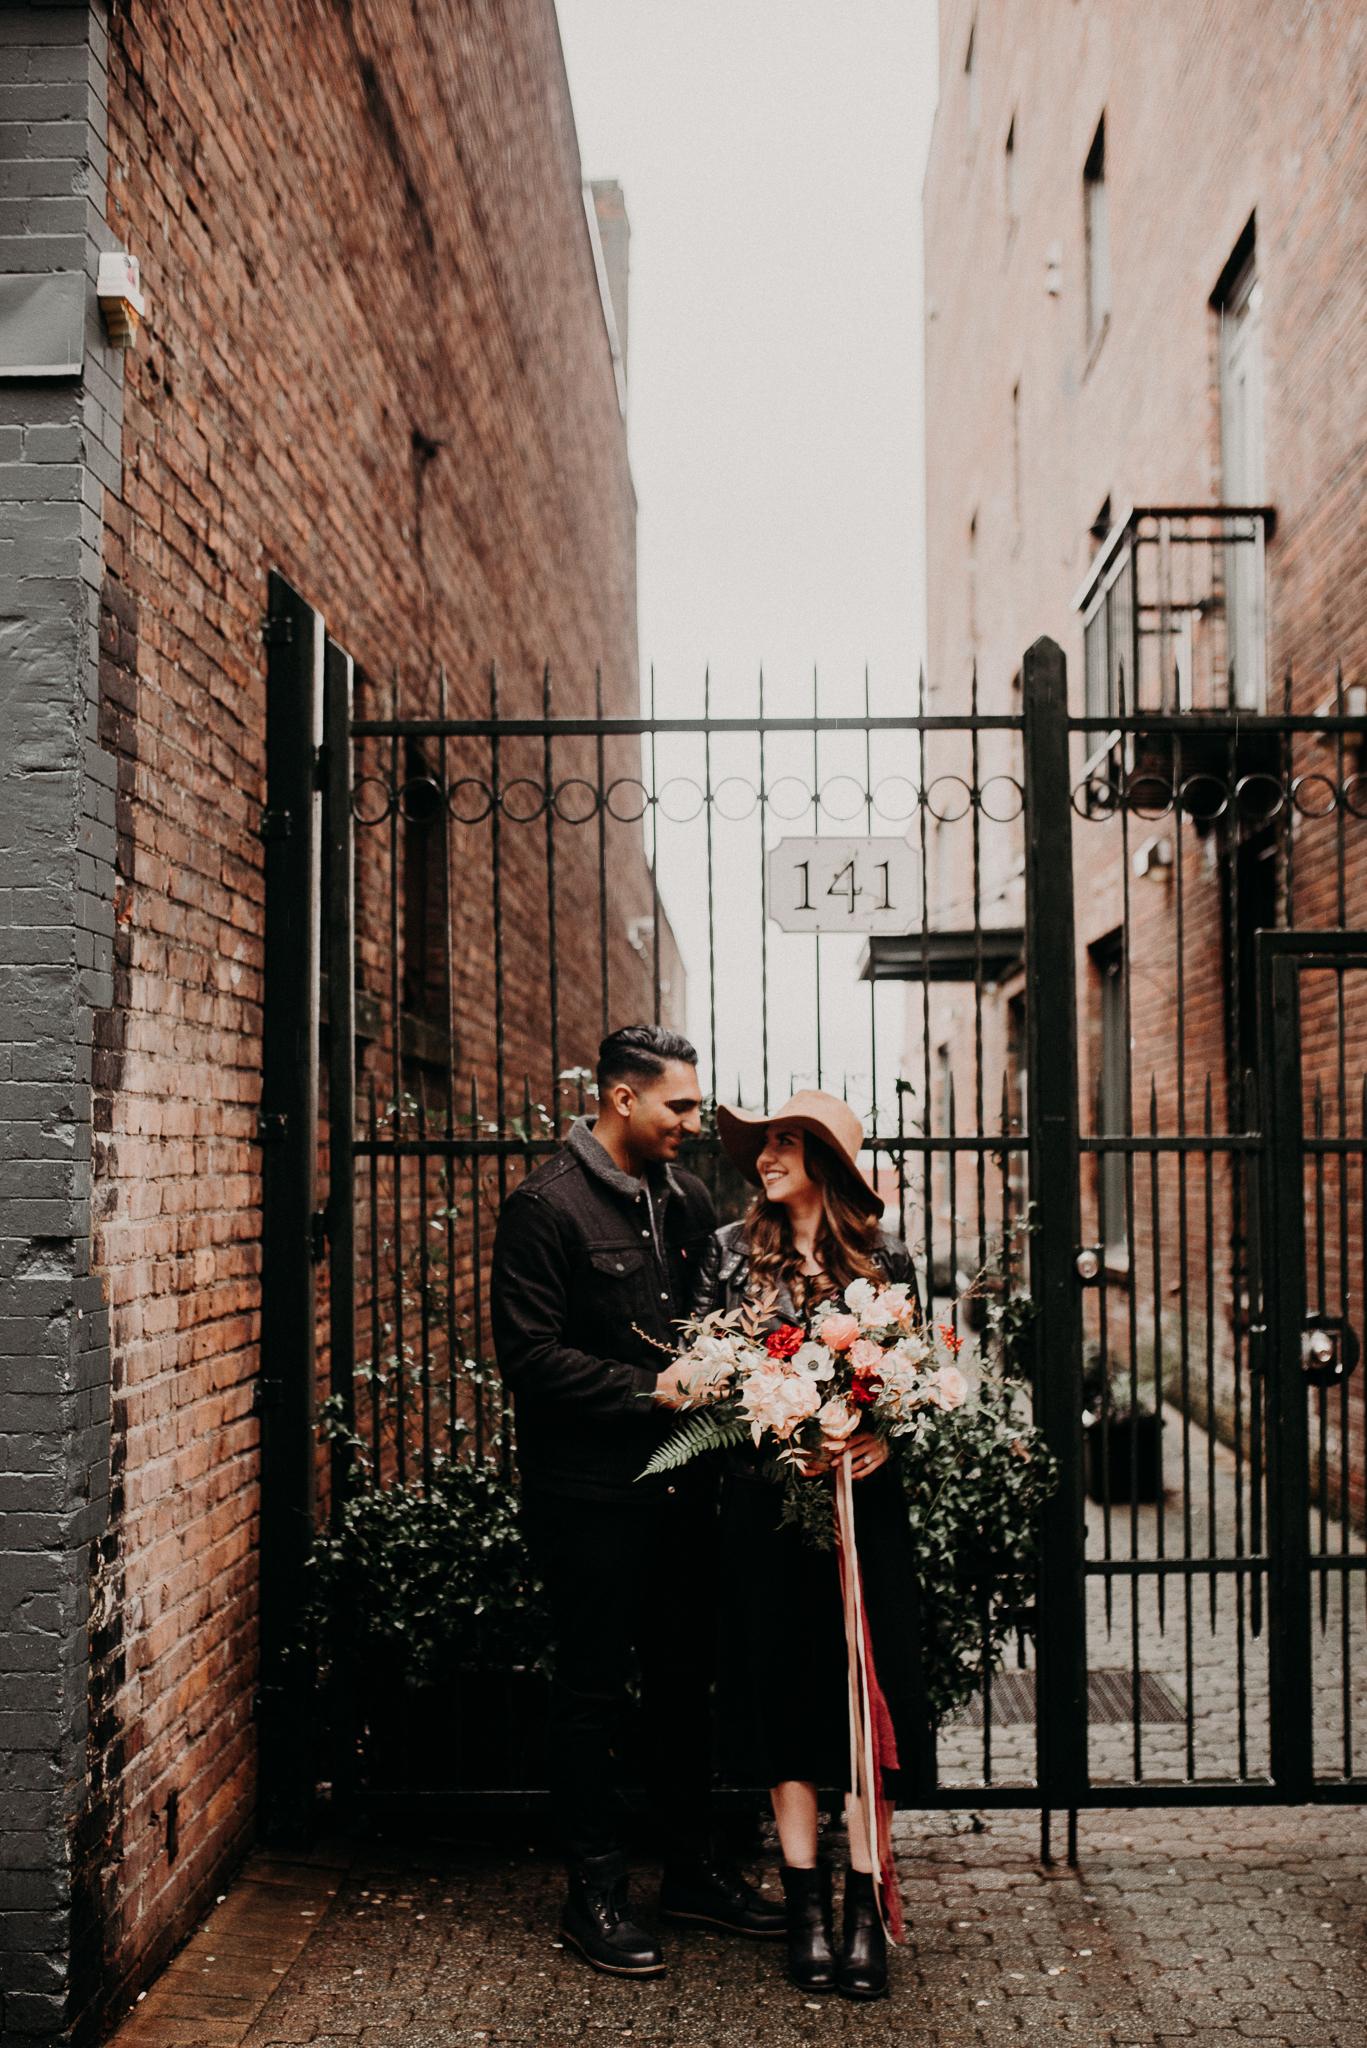 Maddie & Jas Gastown Vancouver Engagement Session - Laura Olson Photography - Sunshine Coast BC Photographer - Vancouver Photographer-2572.jpg